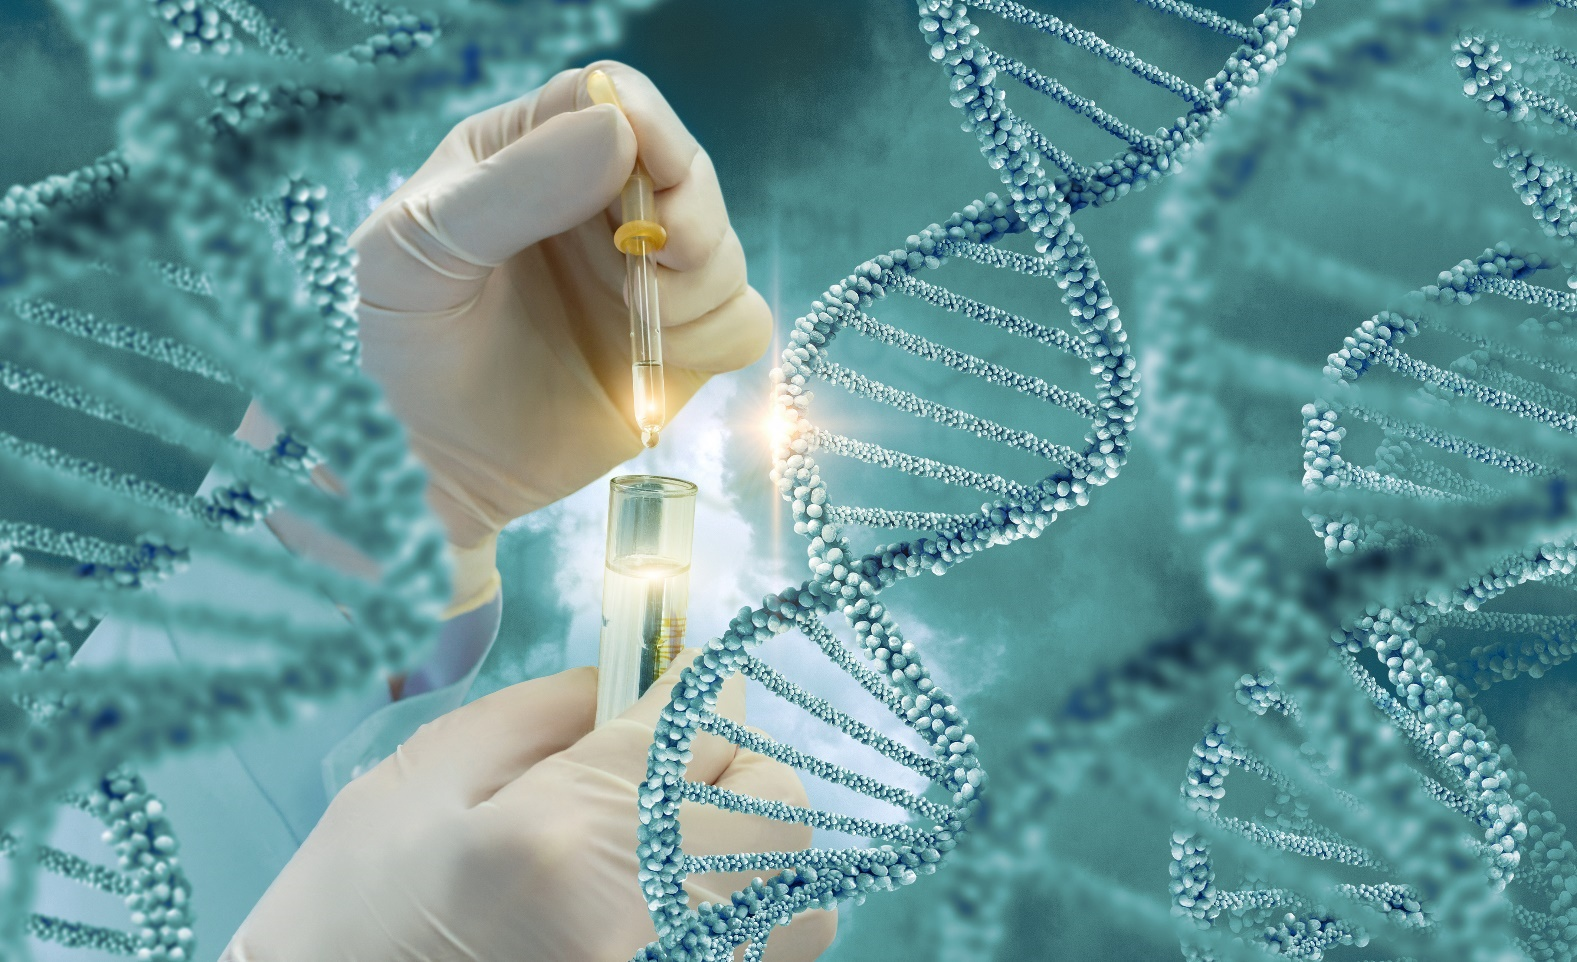 Molecular Diagnostics Technology To Attain A Market